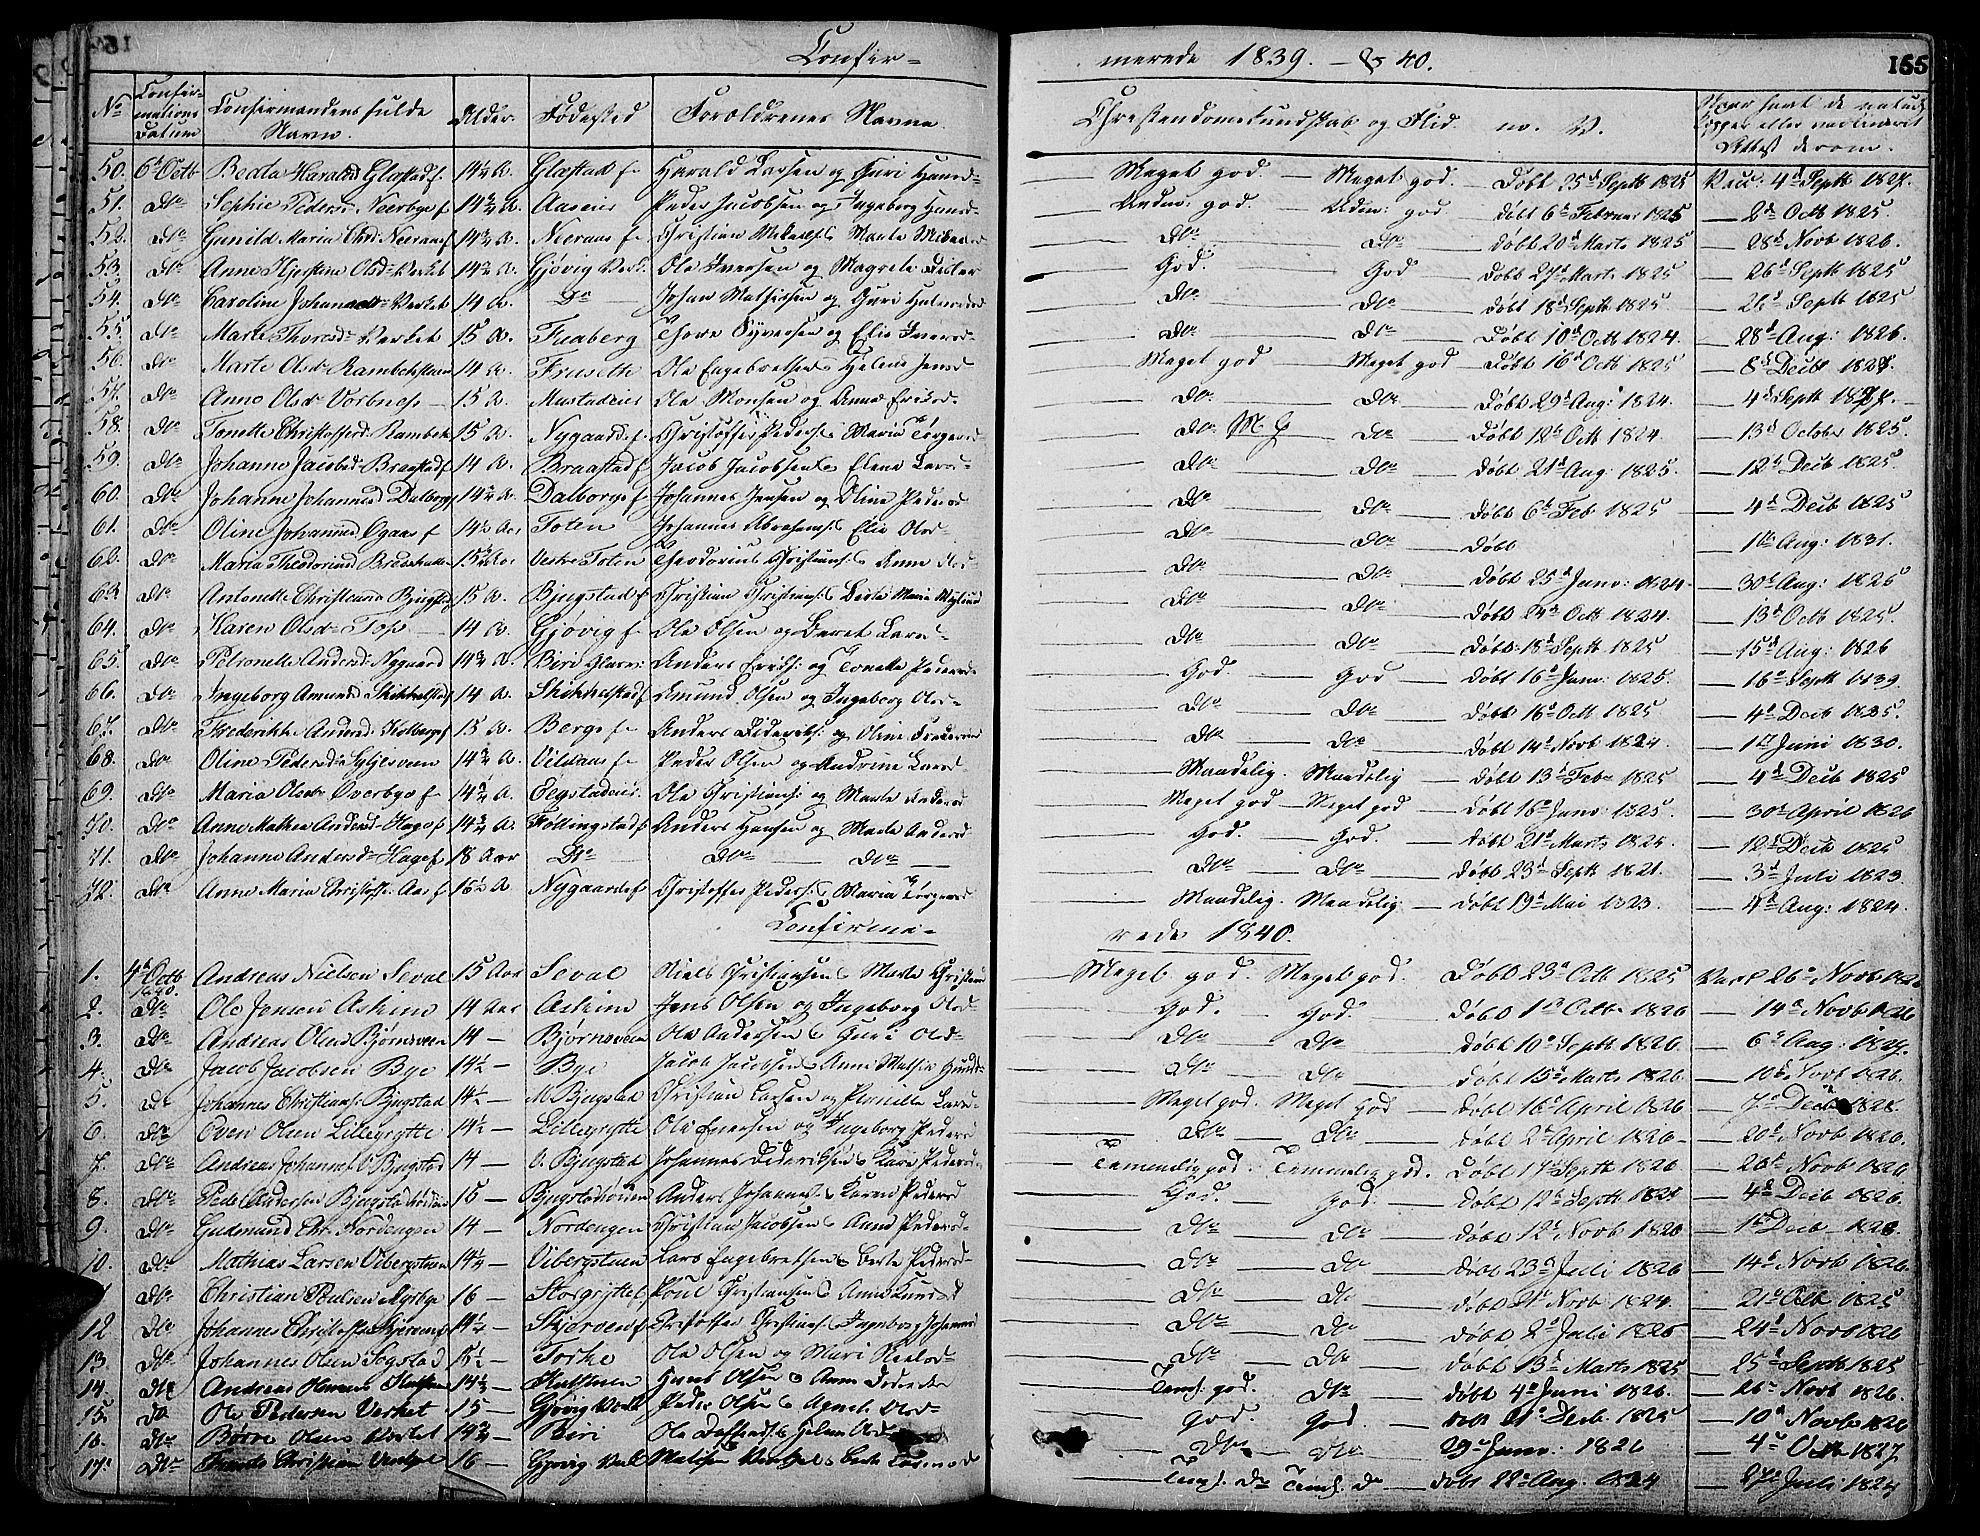 SAH, Vardal prestekontor, H/Ha/Hab/L0004: Klokkerbok nr. 4, 1831-1853, s. 155